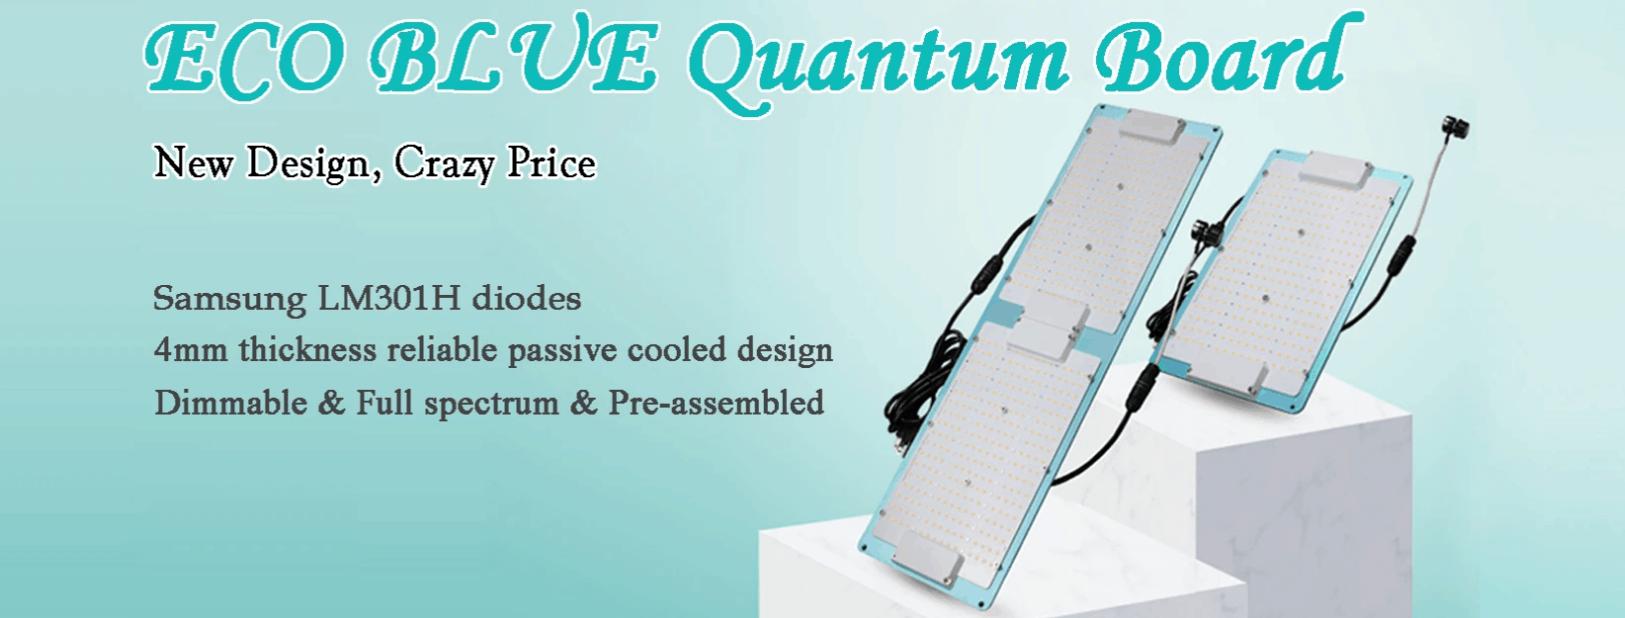 ECO Farm Coupons Blue Quantum Boards